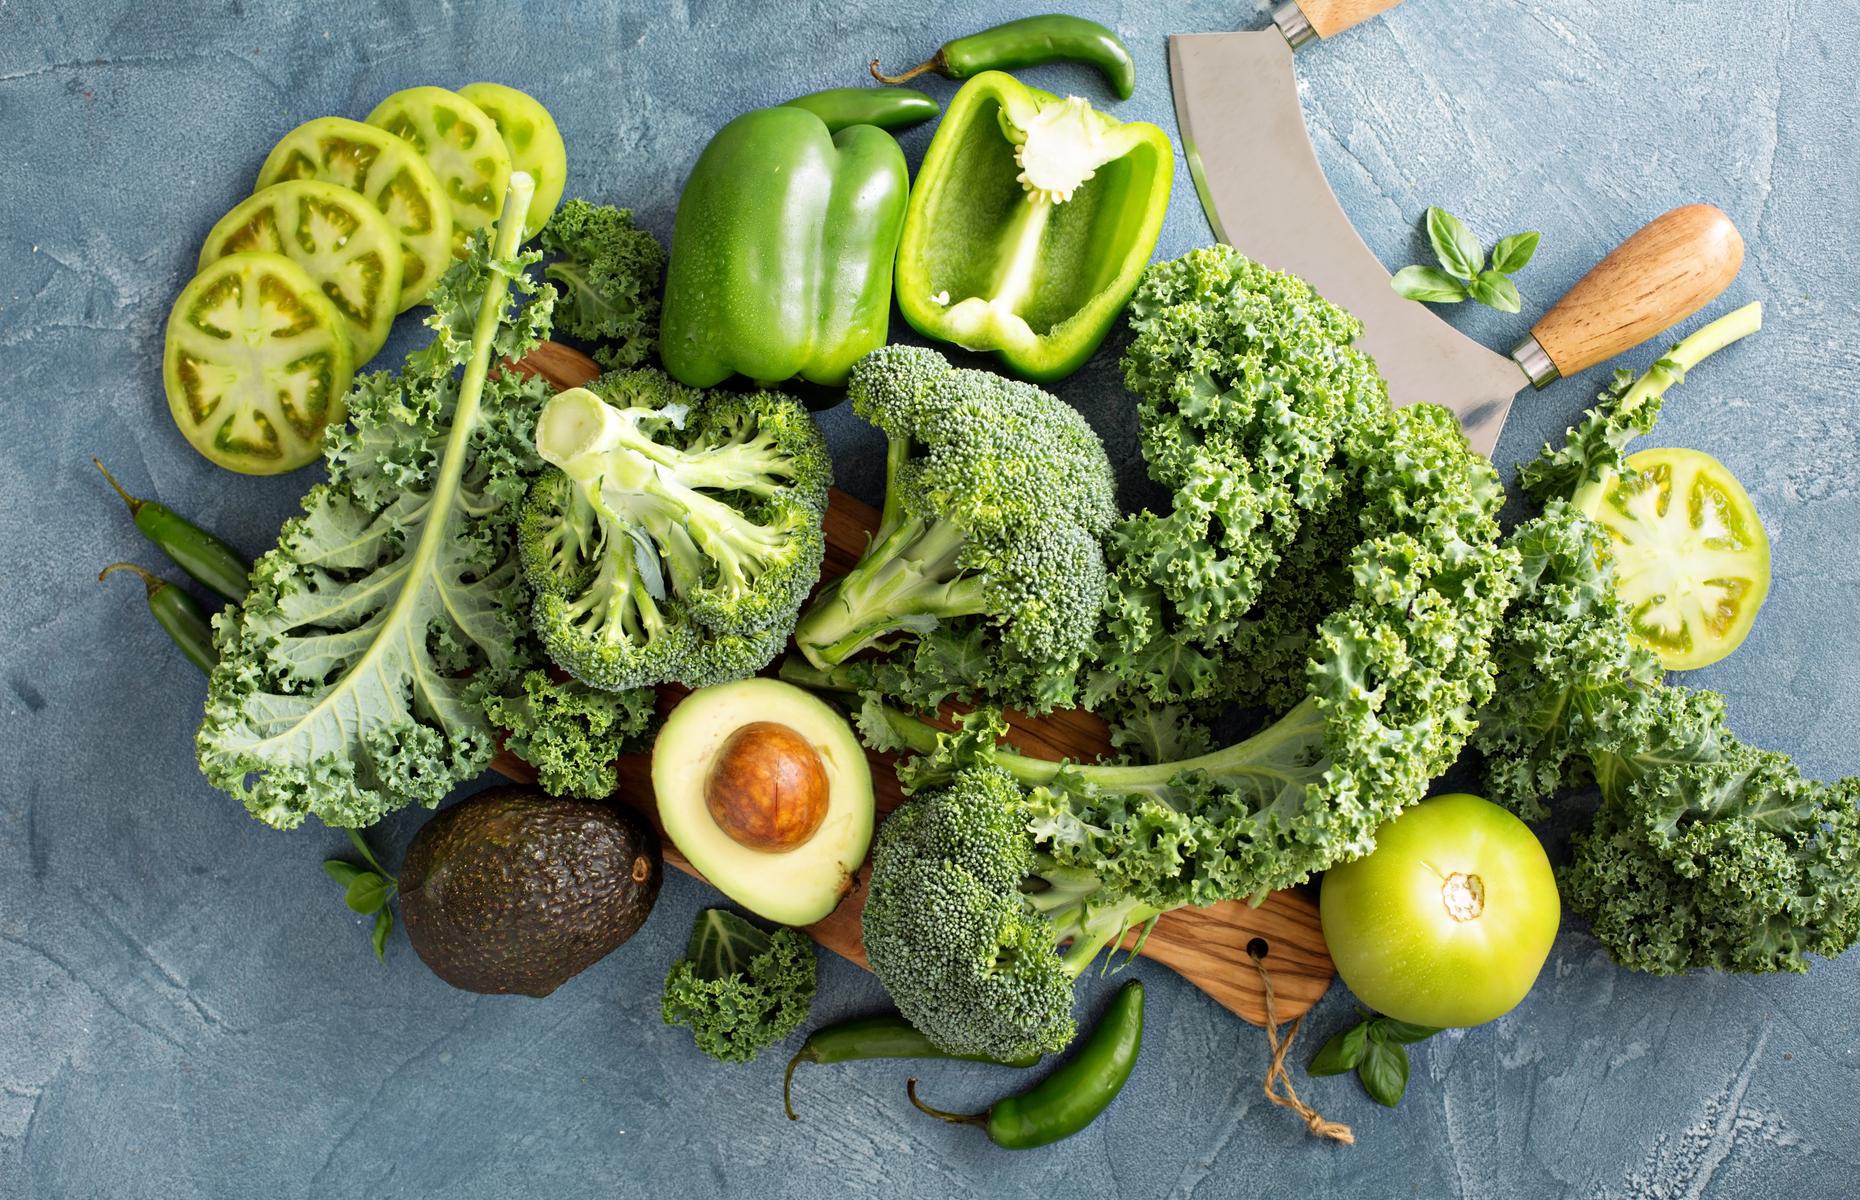 Mixed green vegetables (Image: Elena Veselova/Shutterstock)